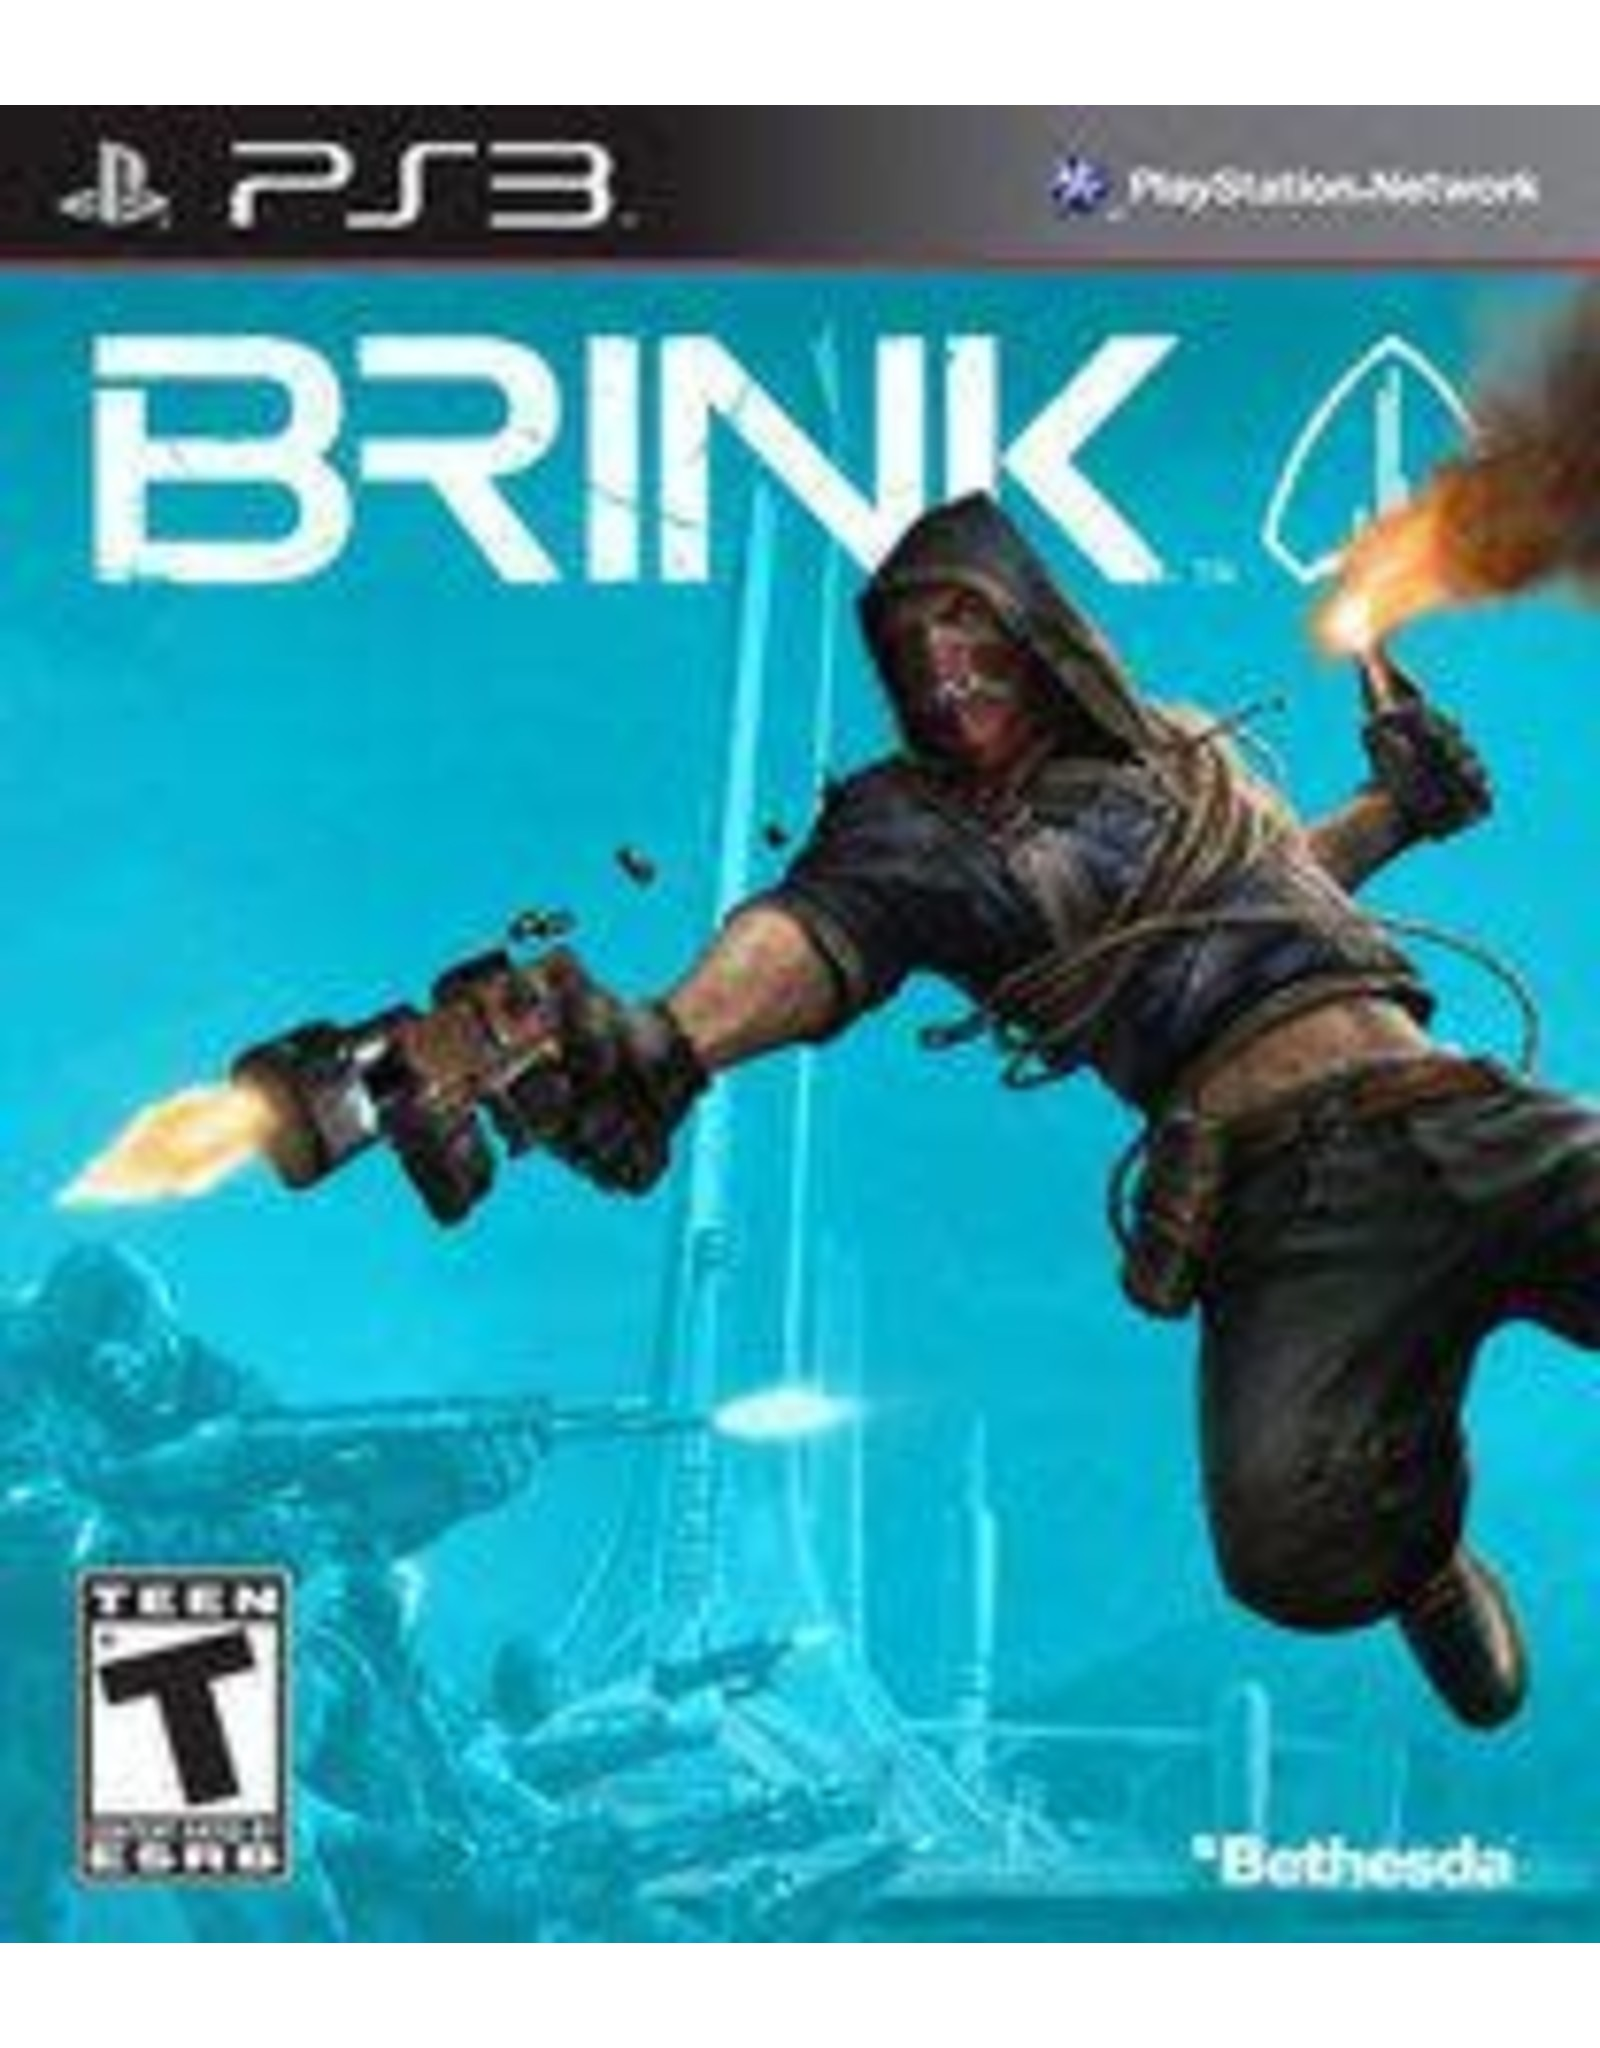 Playstation 3 Brink